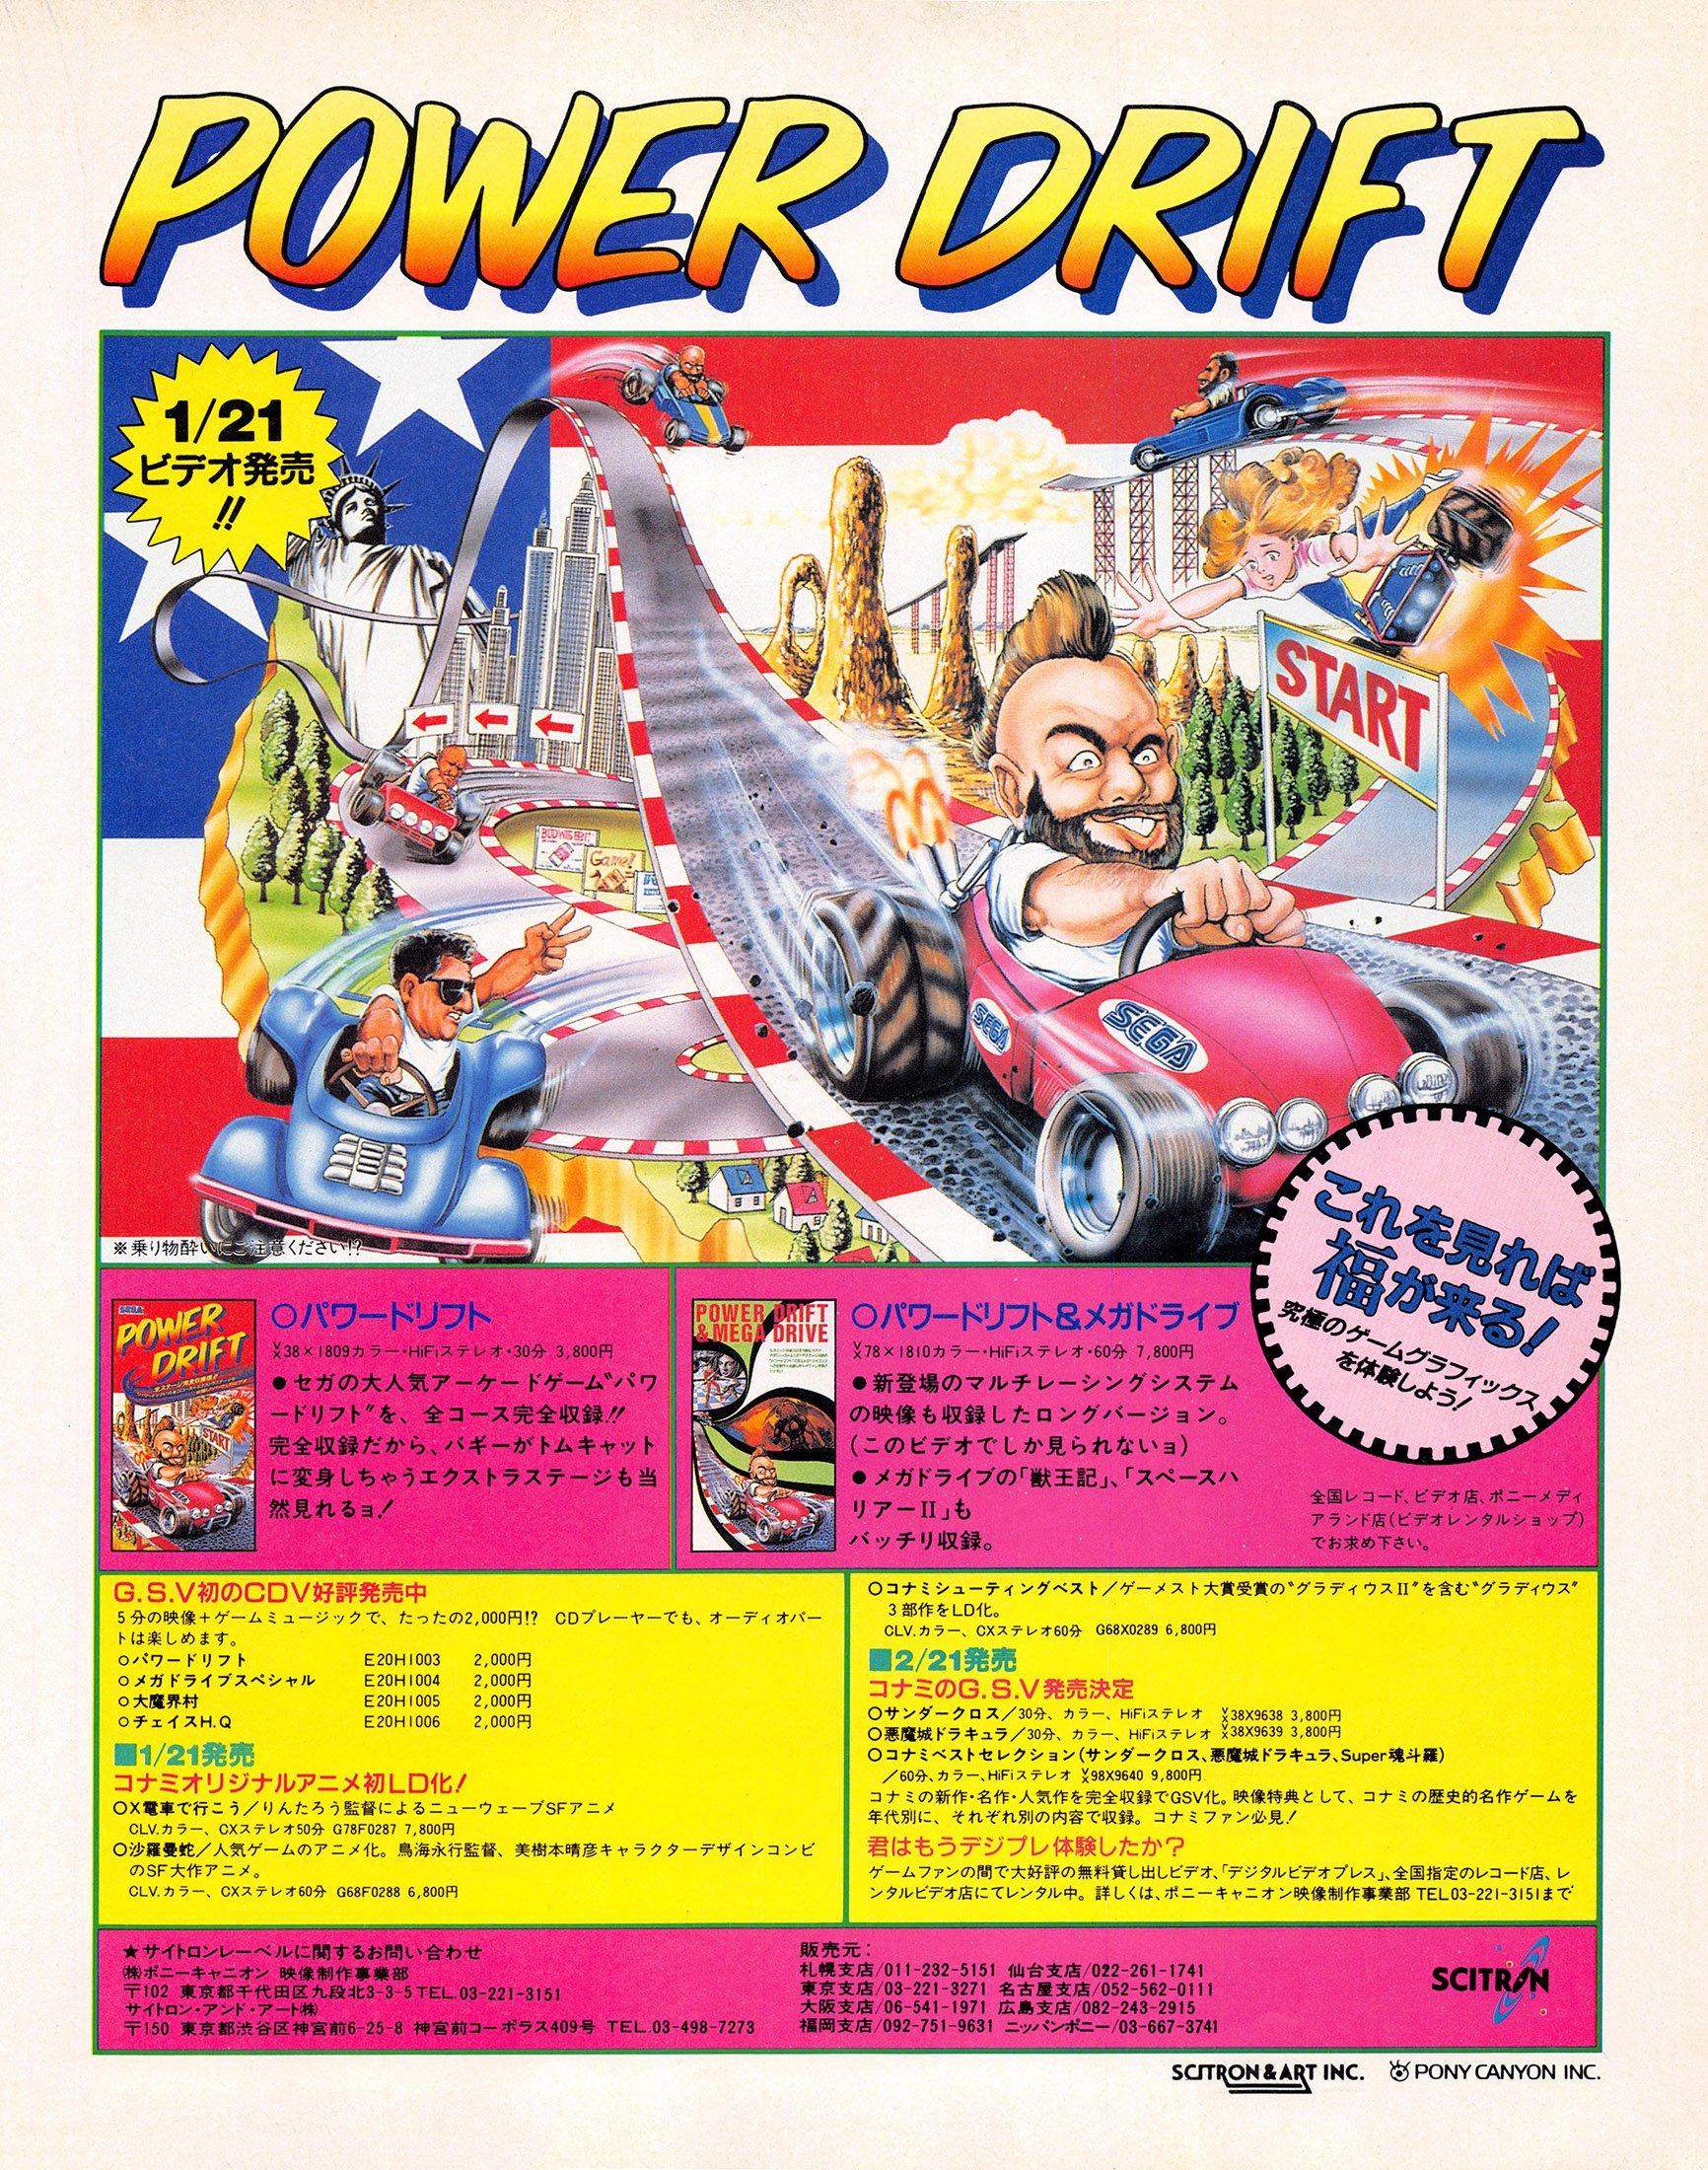 Power Drift VHS (Japan)